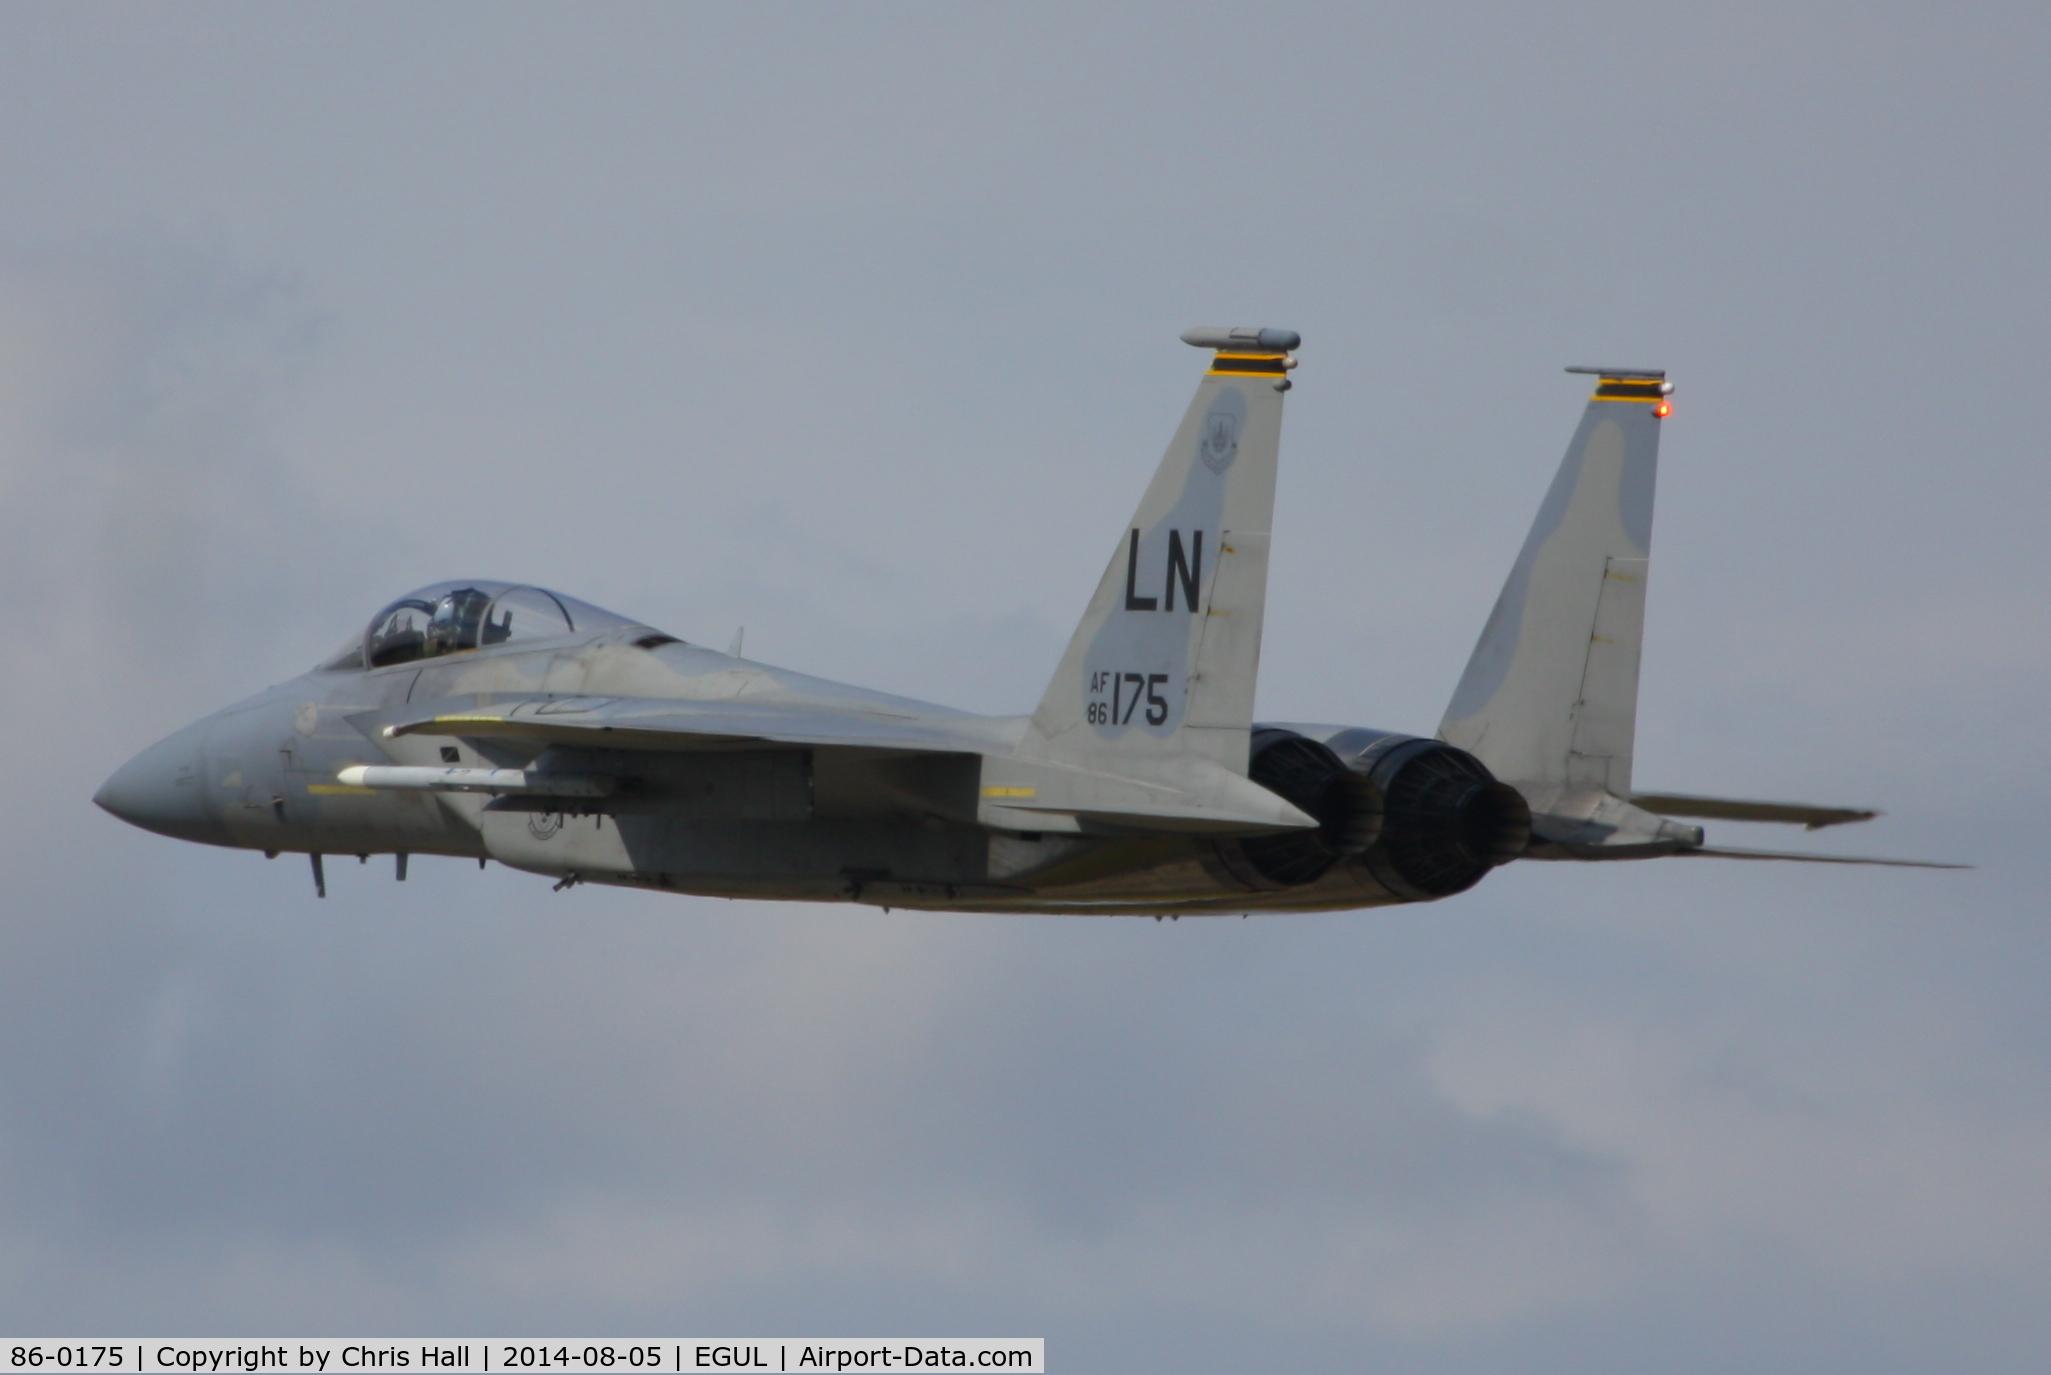 86-0175, 1986 McDonnell Douglas F-15C Eagle C/N 1025/C403, 493rd Fighter Squadron, 'Grim Reapers'